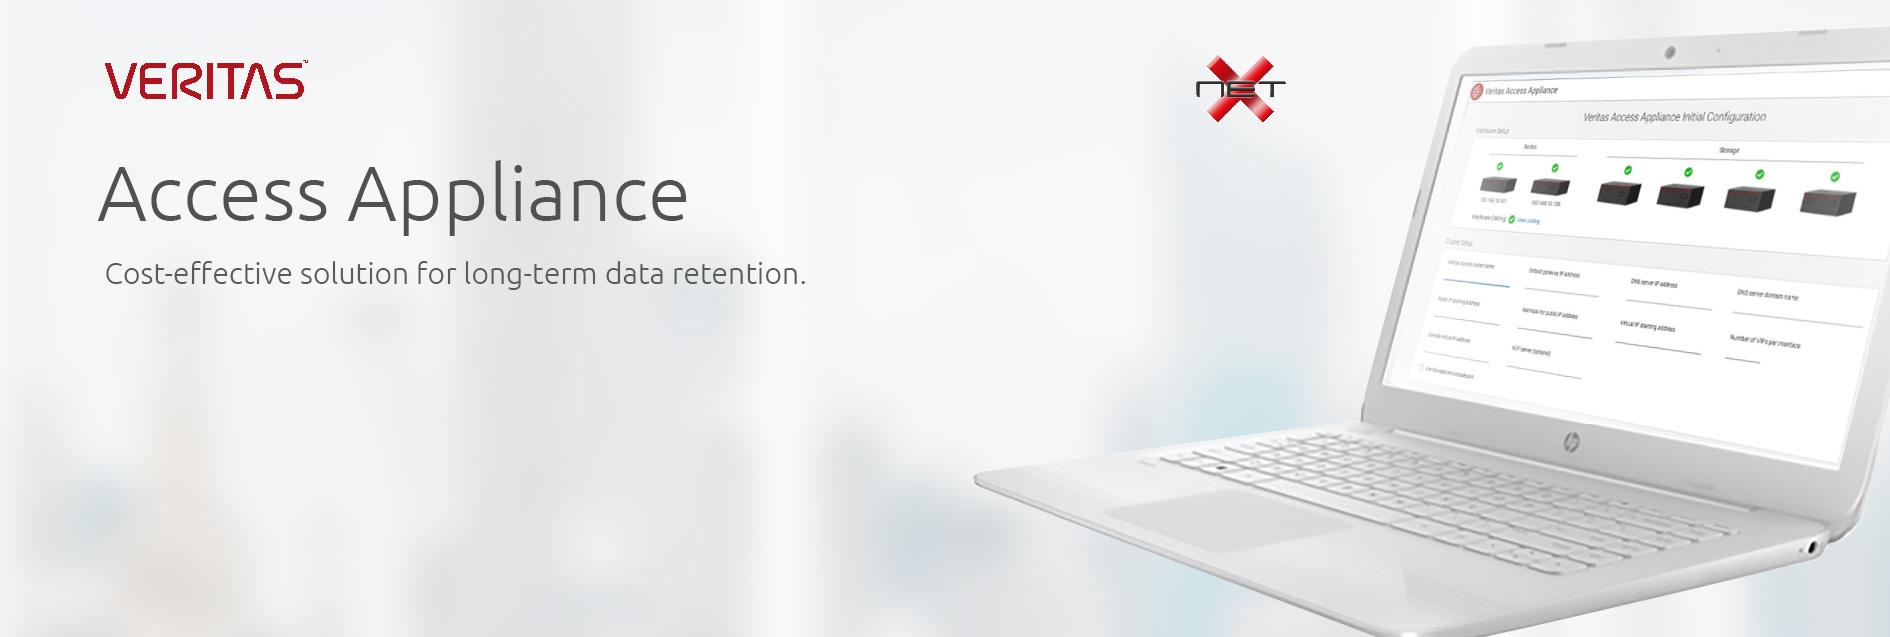 netx-veritas-access-appliance services banner